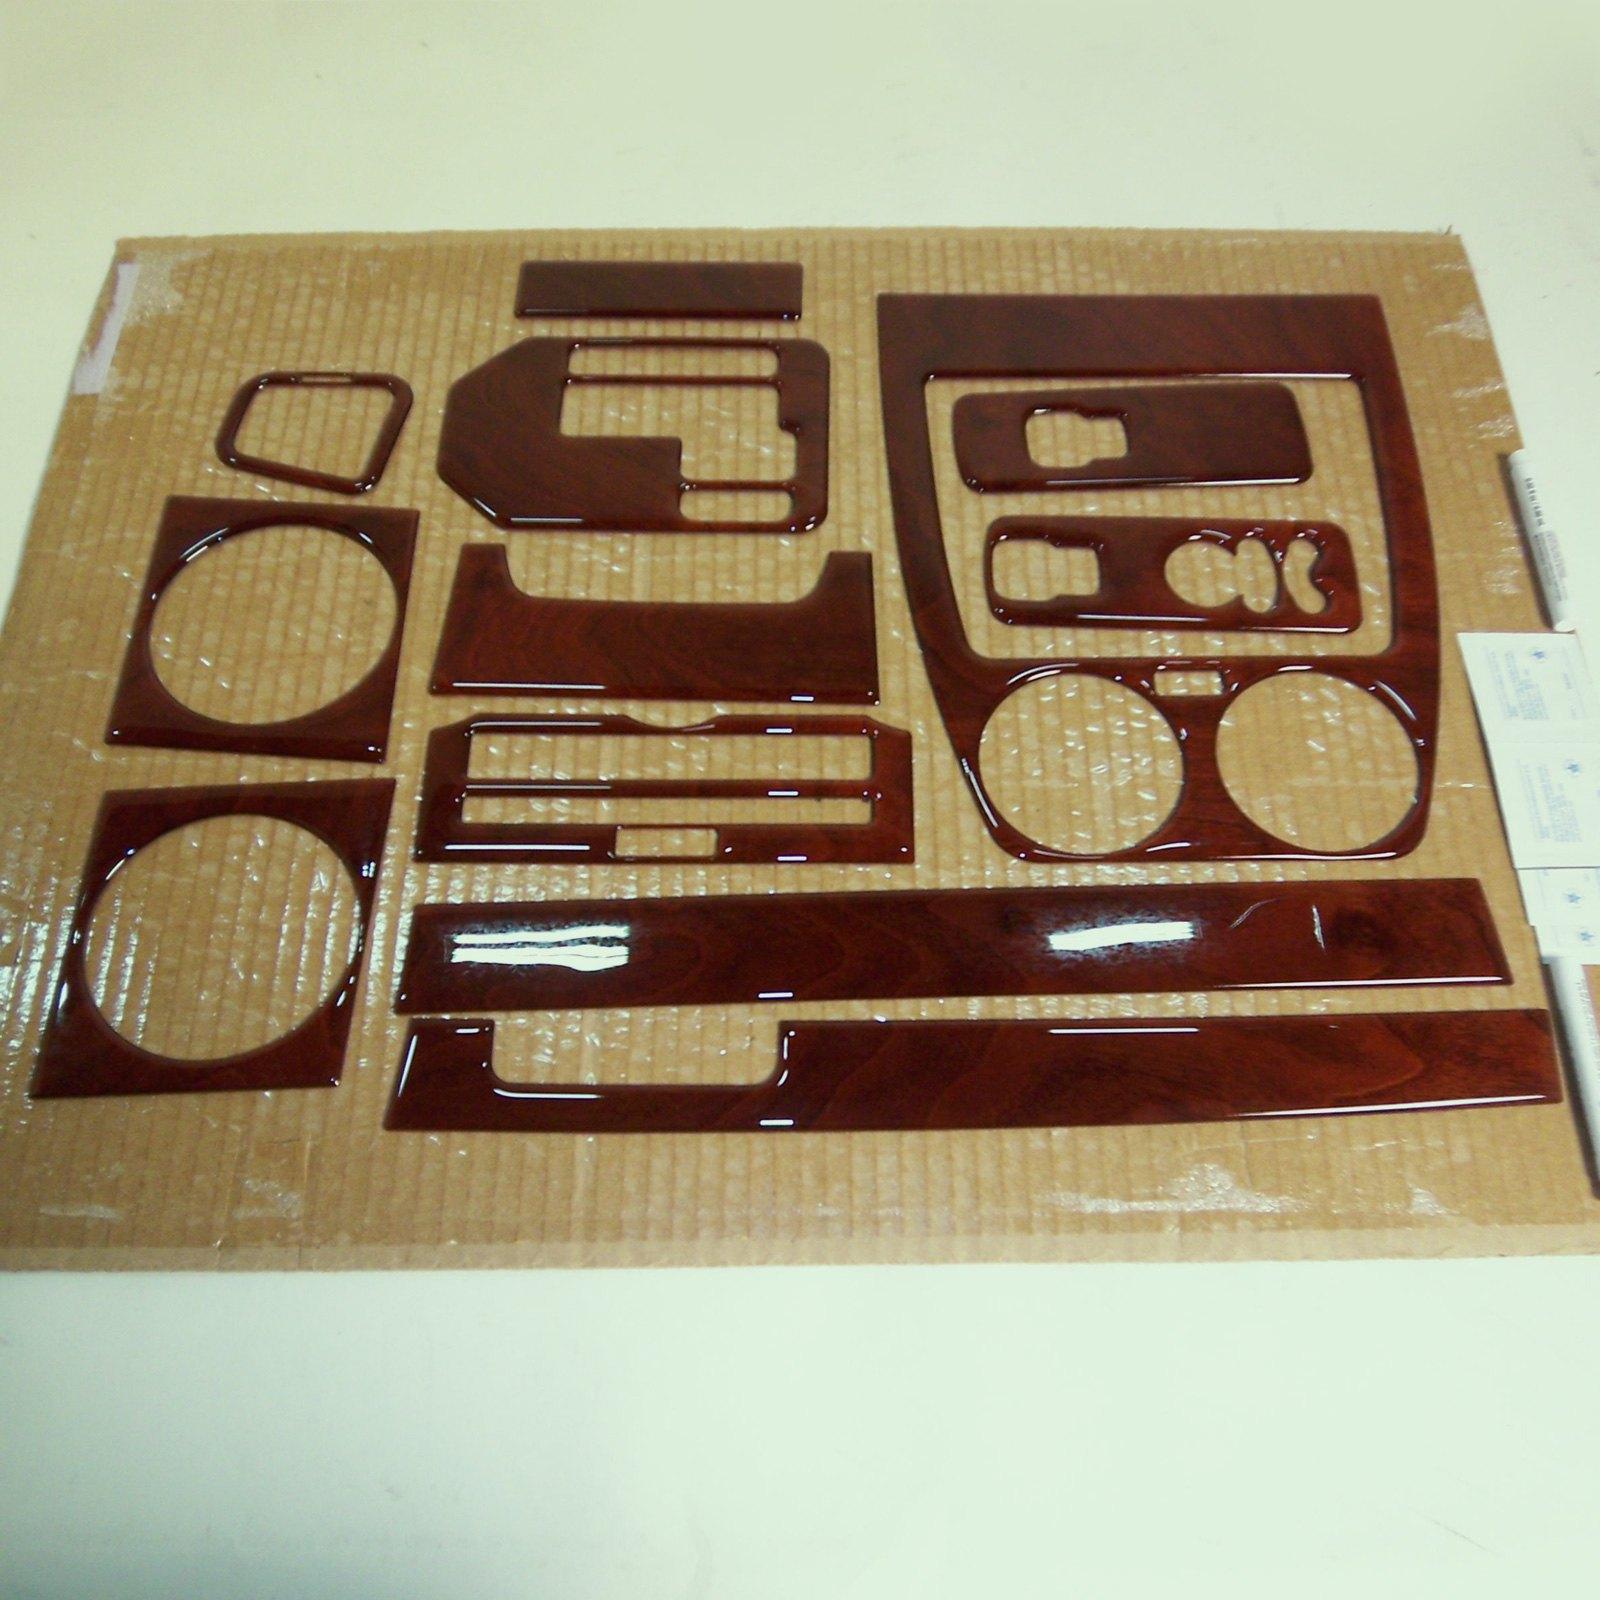 Remin exterior materials - Remin Exterior Materials 7